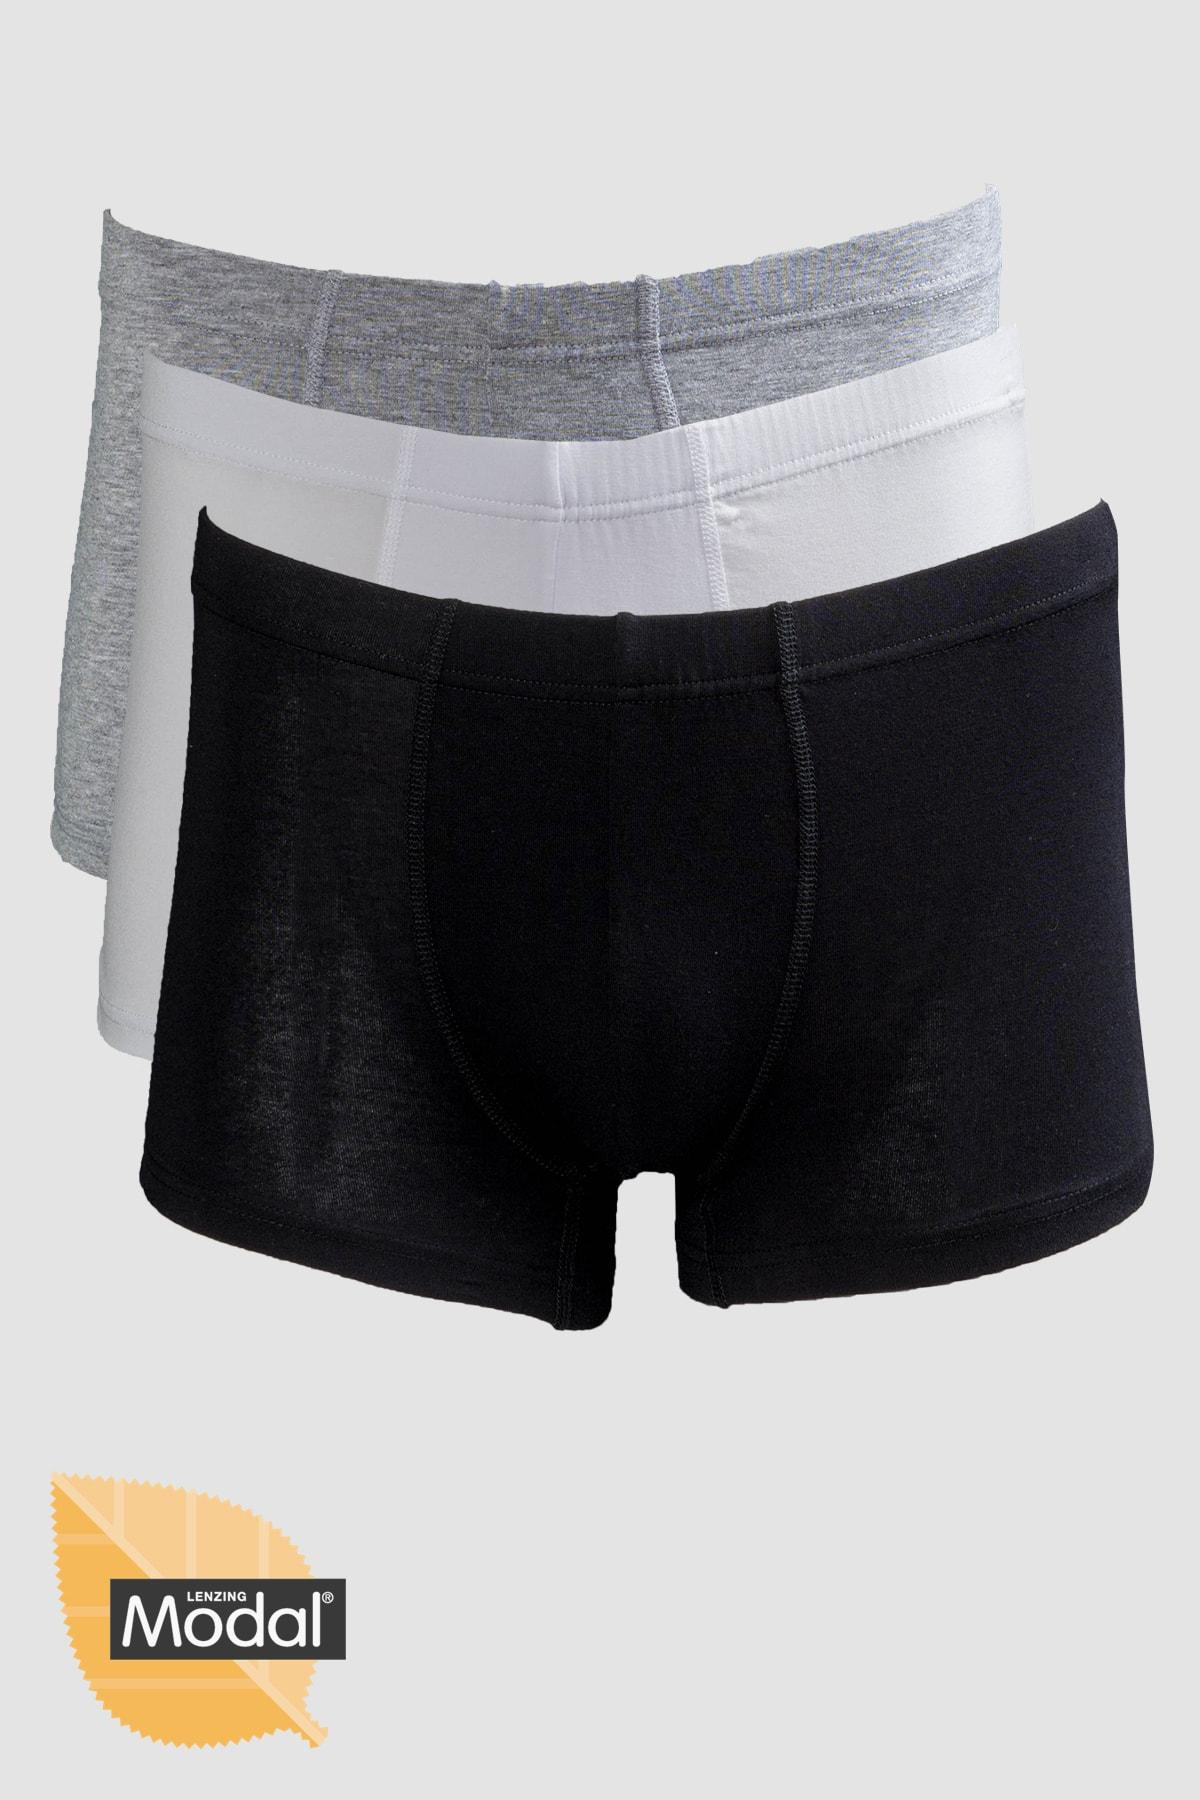 Erkek 3'lü Modal Pamuk Siyah Beyaz Gri Kısa Boxer